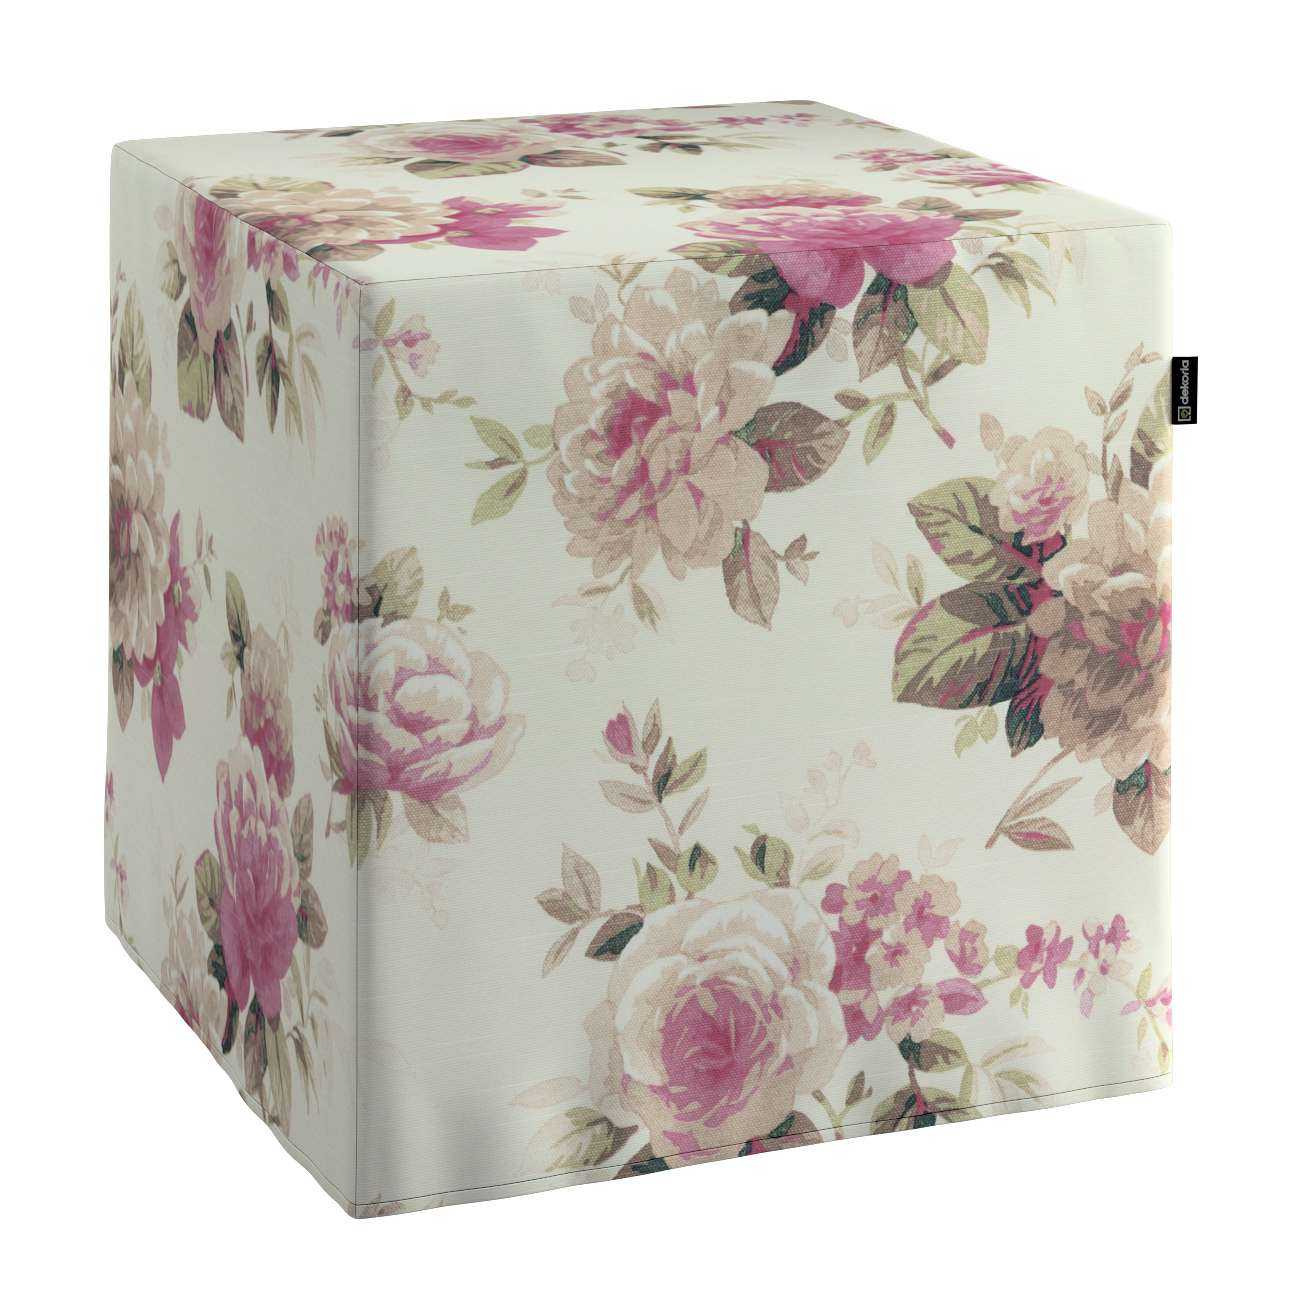 Sedák Cube - kostka pevná 40x40x40 v kolekci Mirella, látka: 141-07